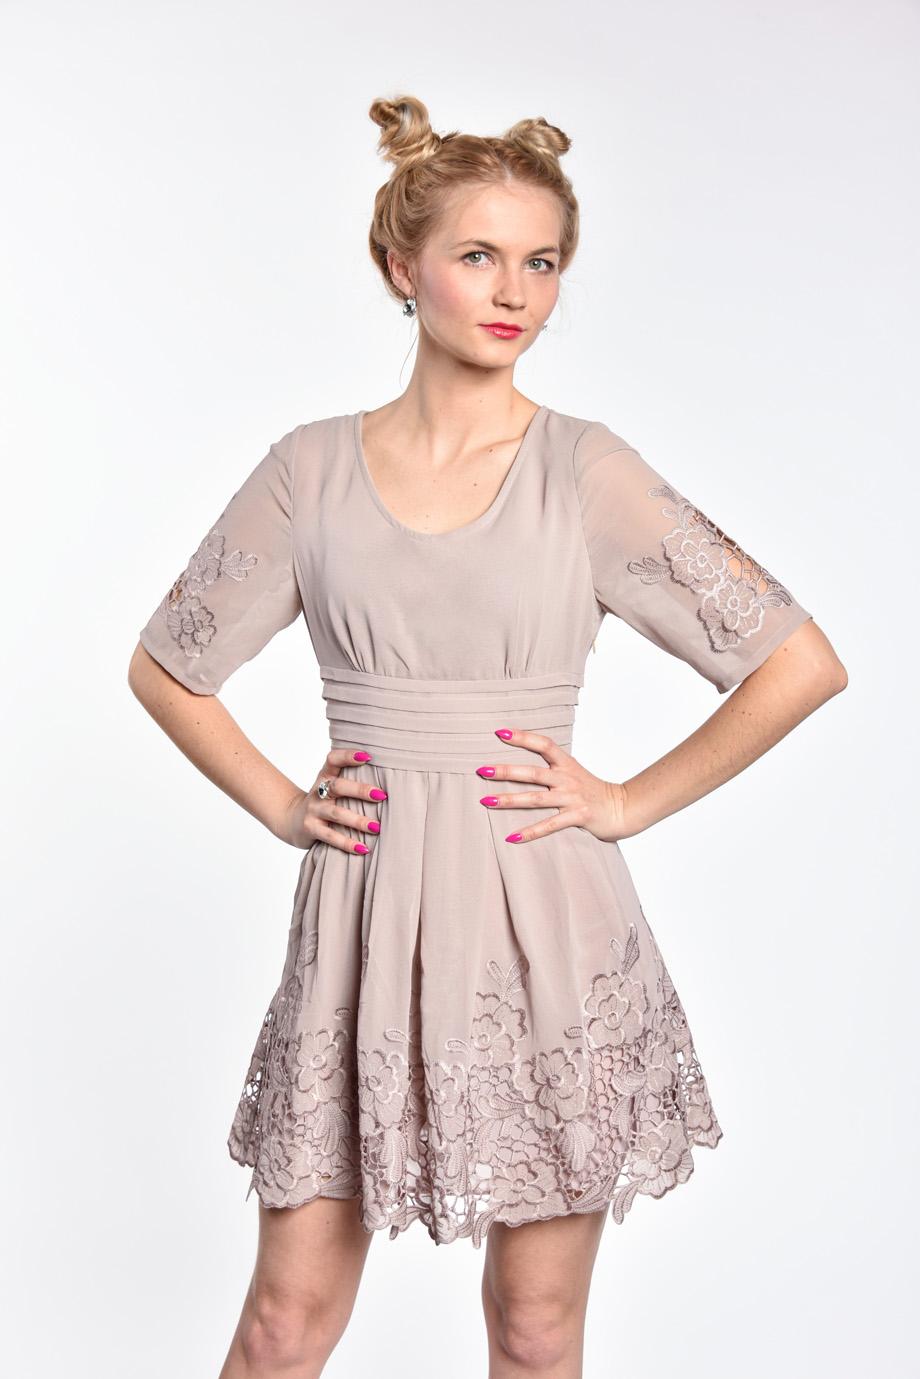 020b56d044ed obrázok 1 Chicwish sivé šaty s rukávom